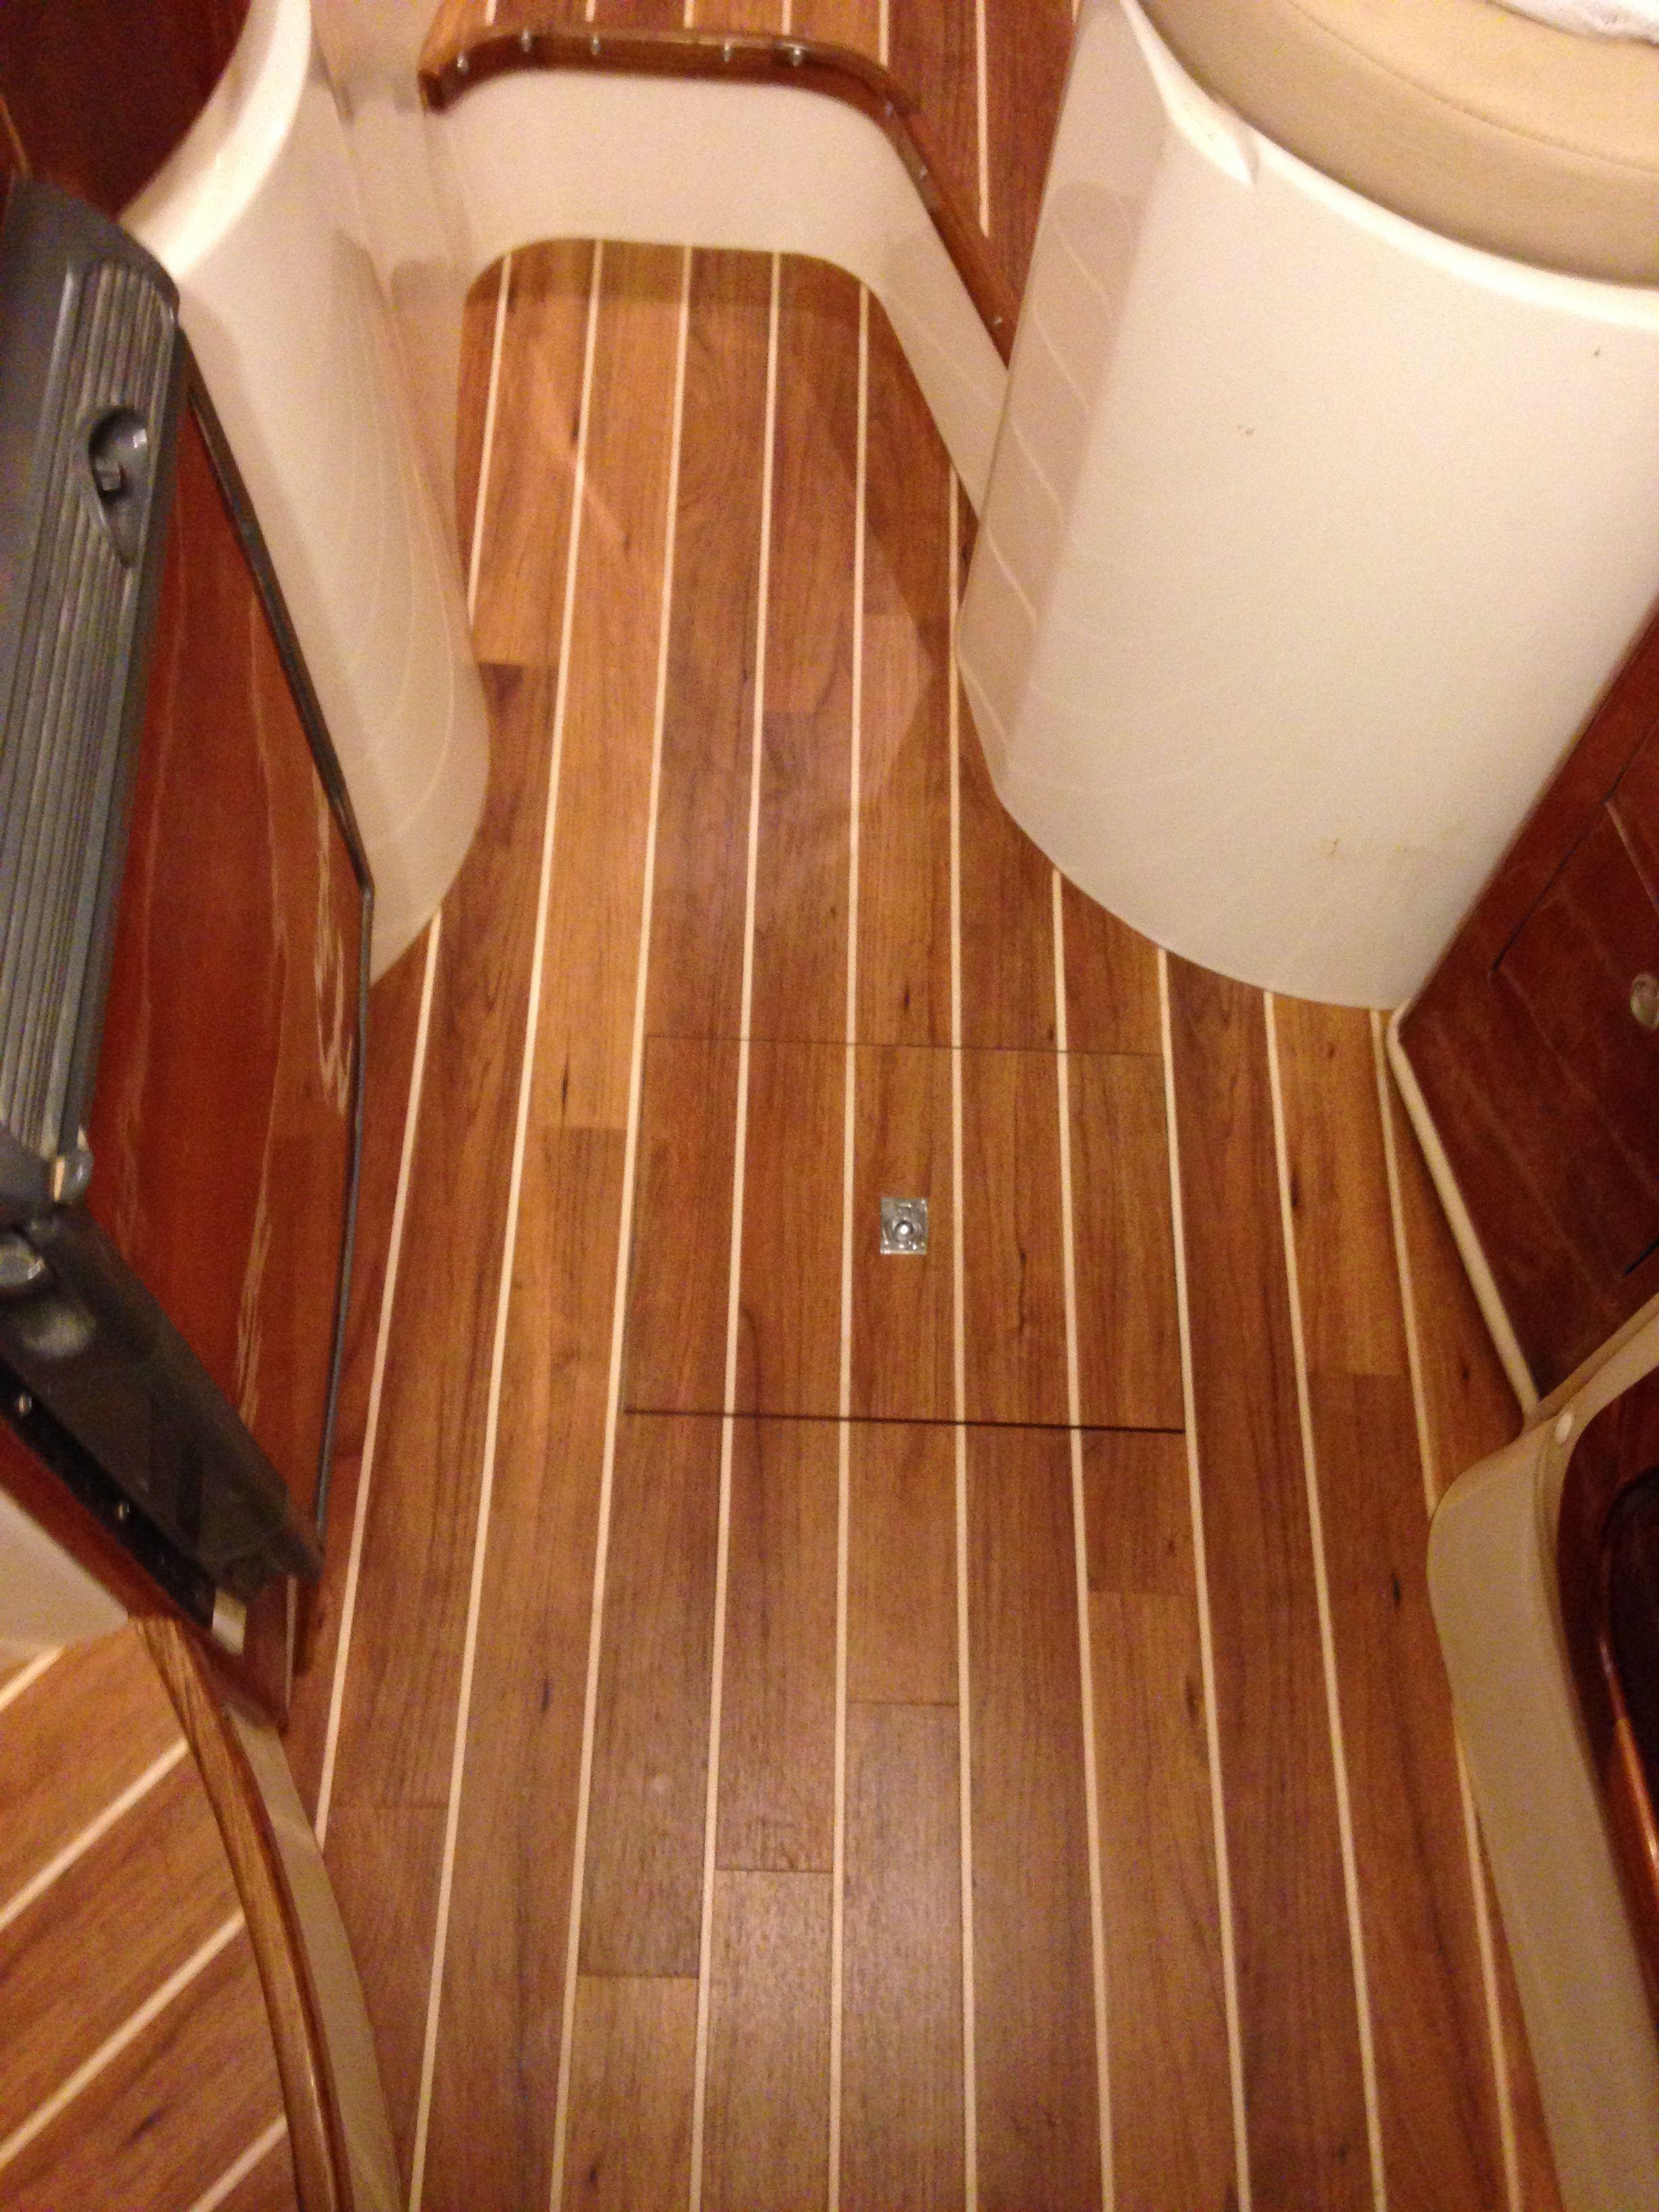 Amtico Interior Flooring Teak Decking Http Www Custommarinecarpentry Com